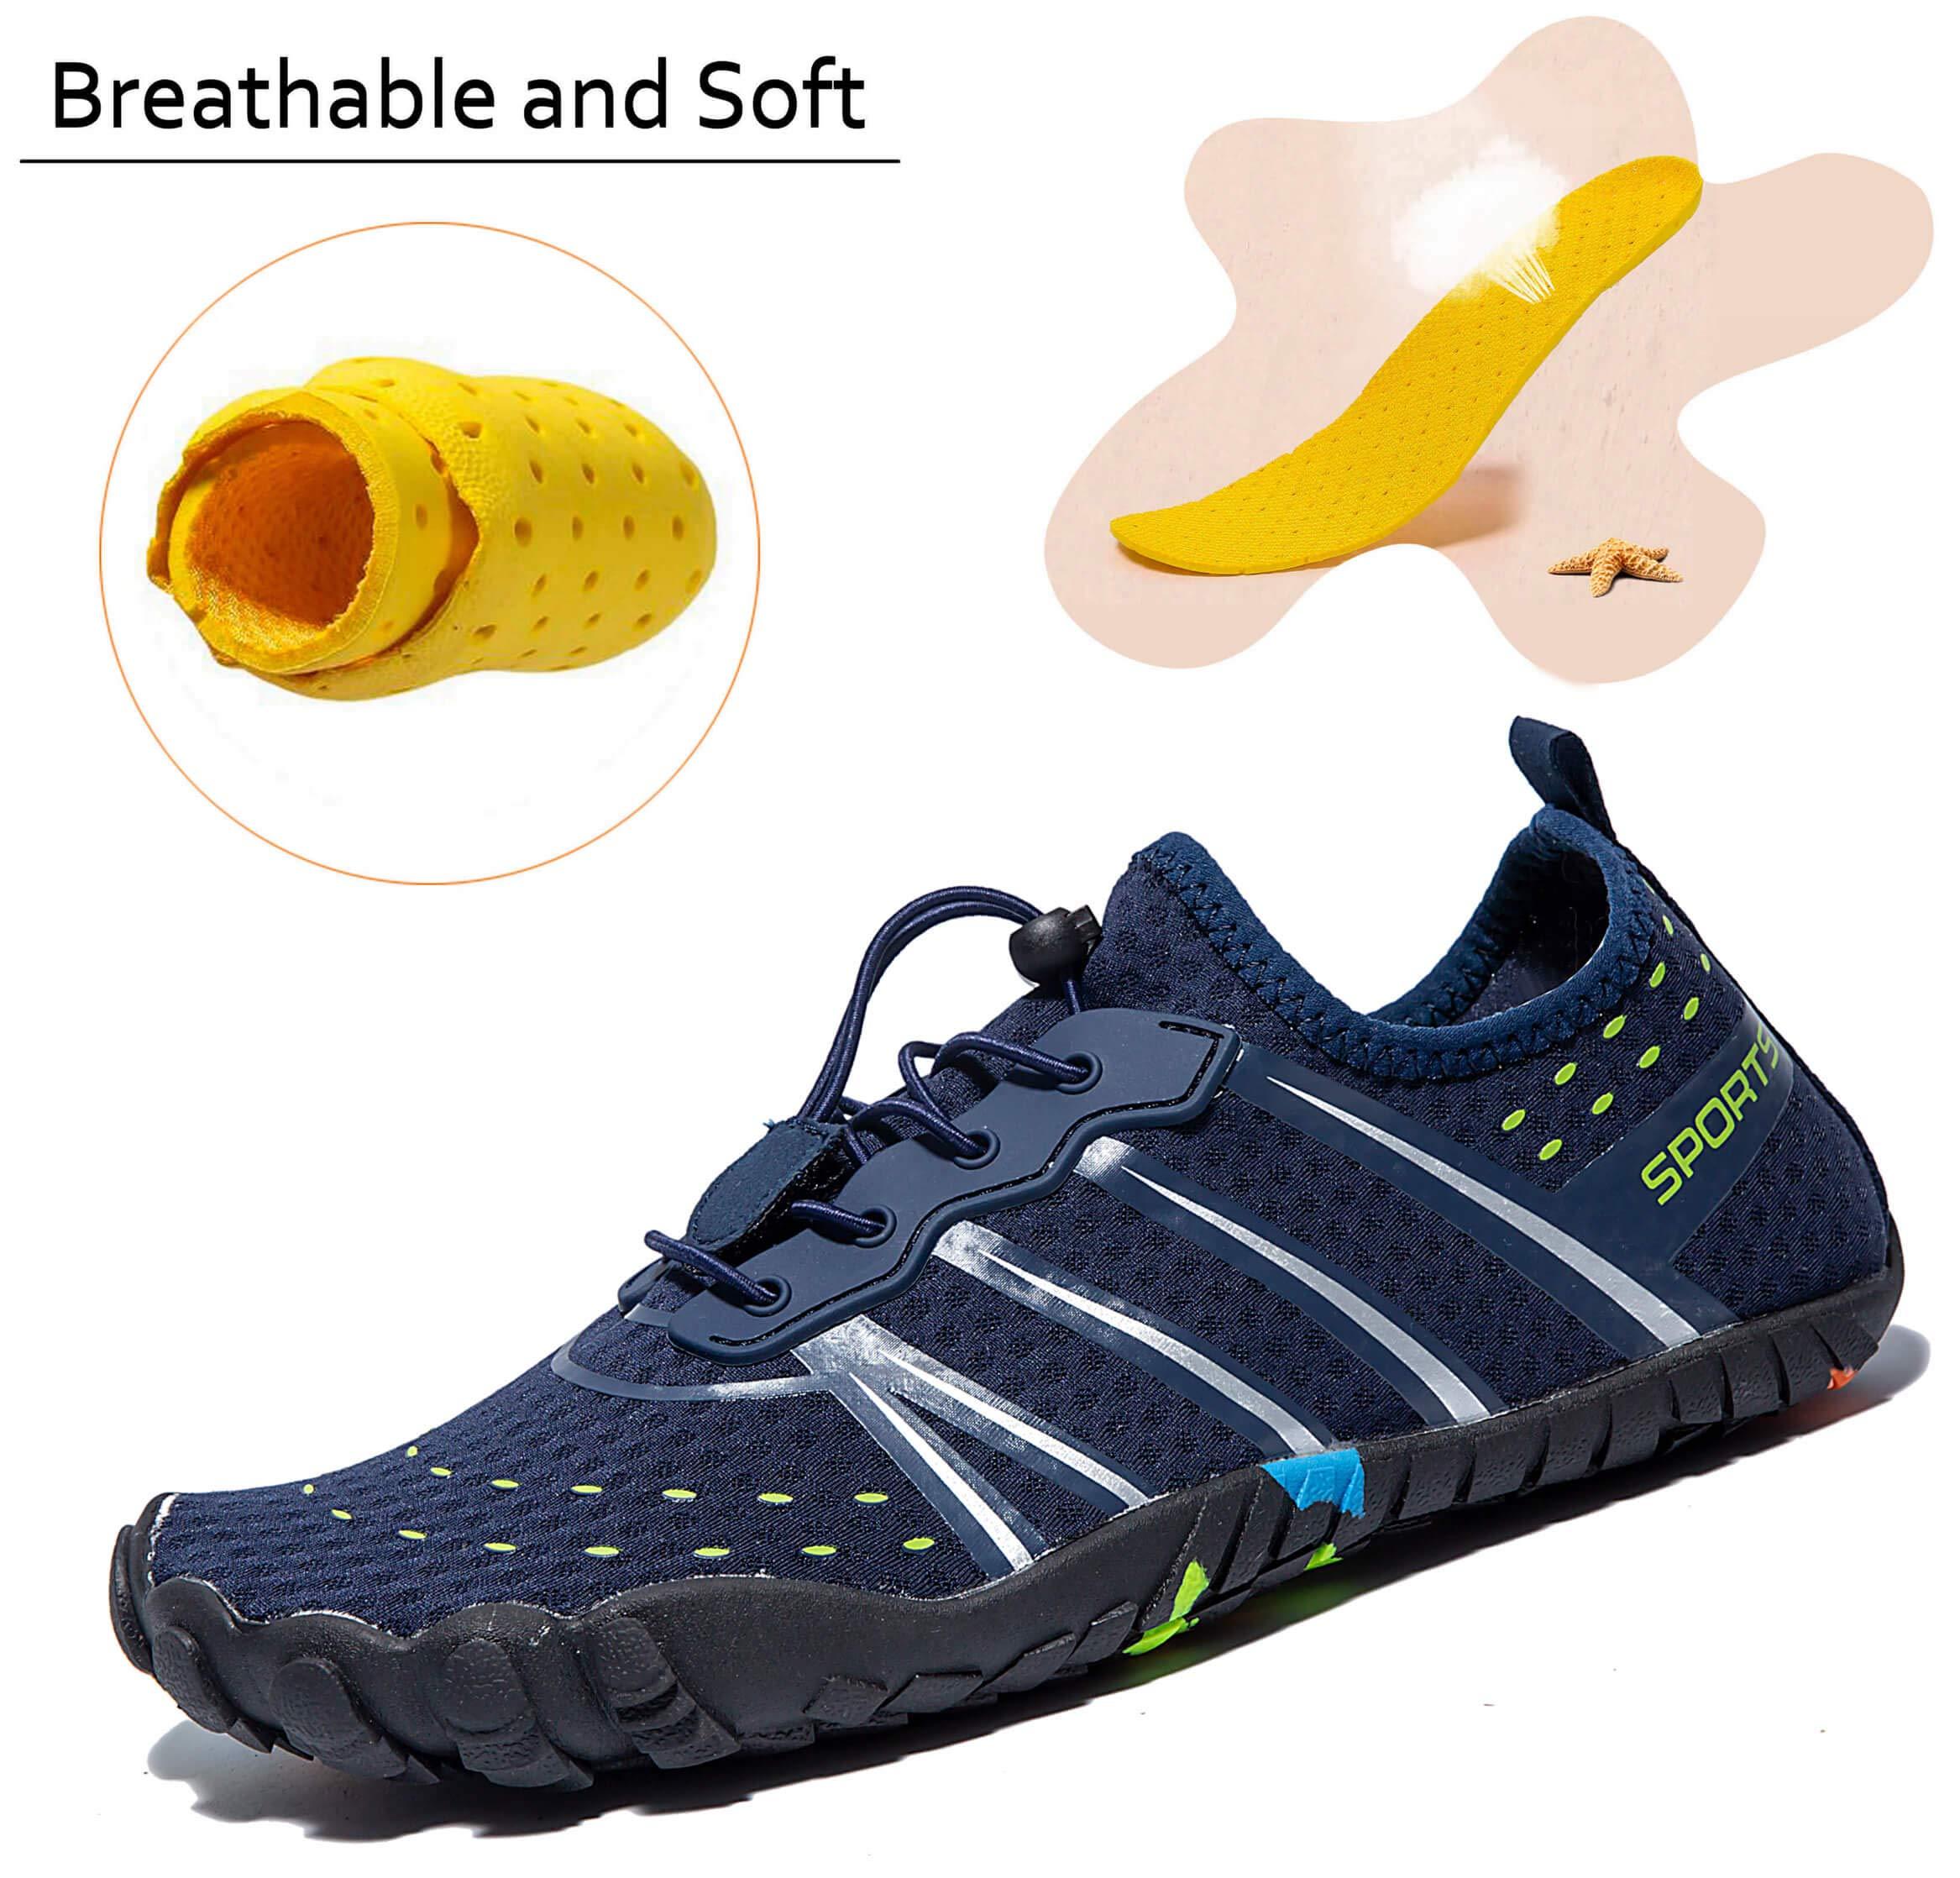 LINGTOM Mens Womens Aqua Water Shoes Quick Dry Barefoot Sports Exercise for Walking Swimming Diving Beach Surf Pool Yoga,Dark Blue 12.5 M US Women / 11 M US Men by LINGTOM (Image #7)